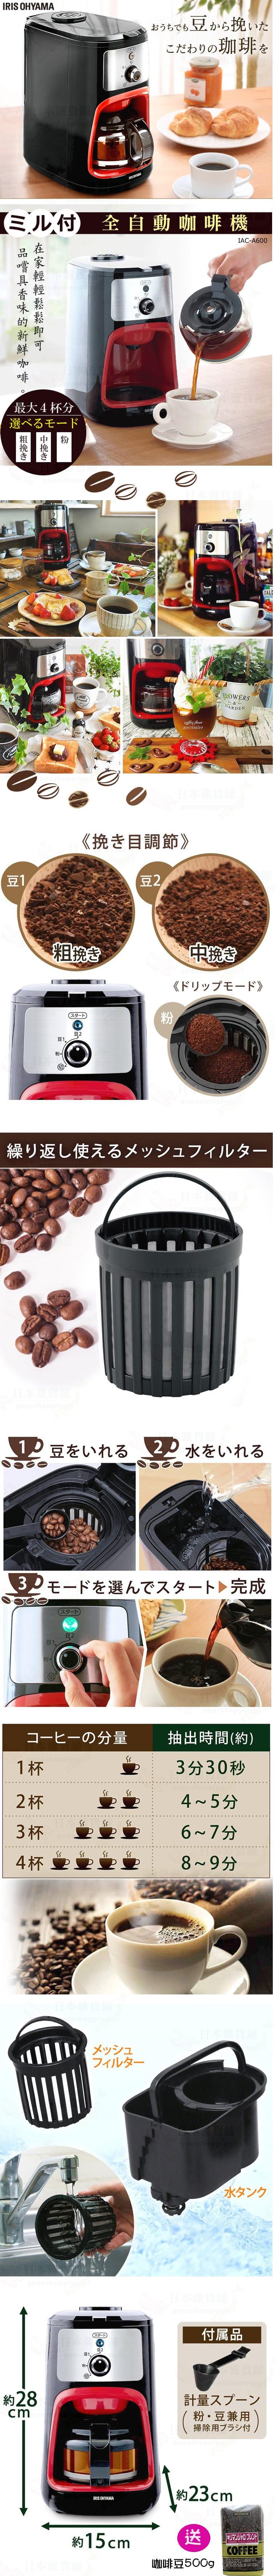 IRIS OHYAMA IAC-A600 全自動咖啡機